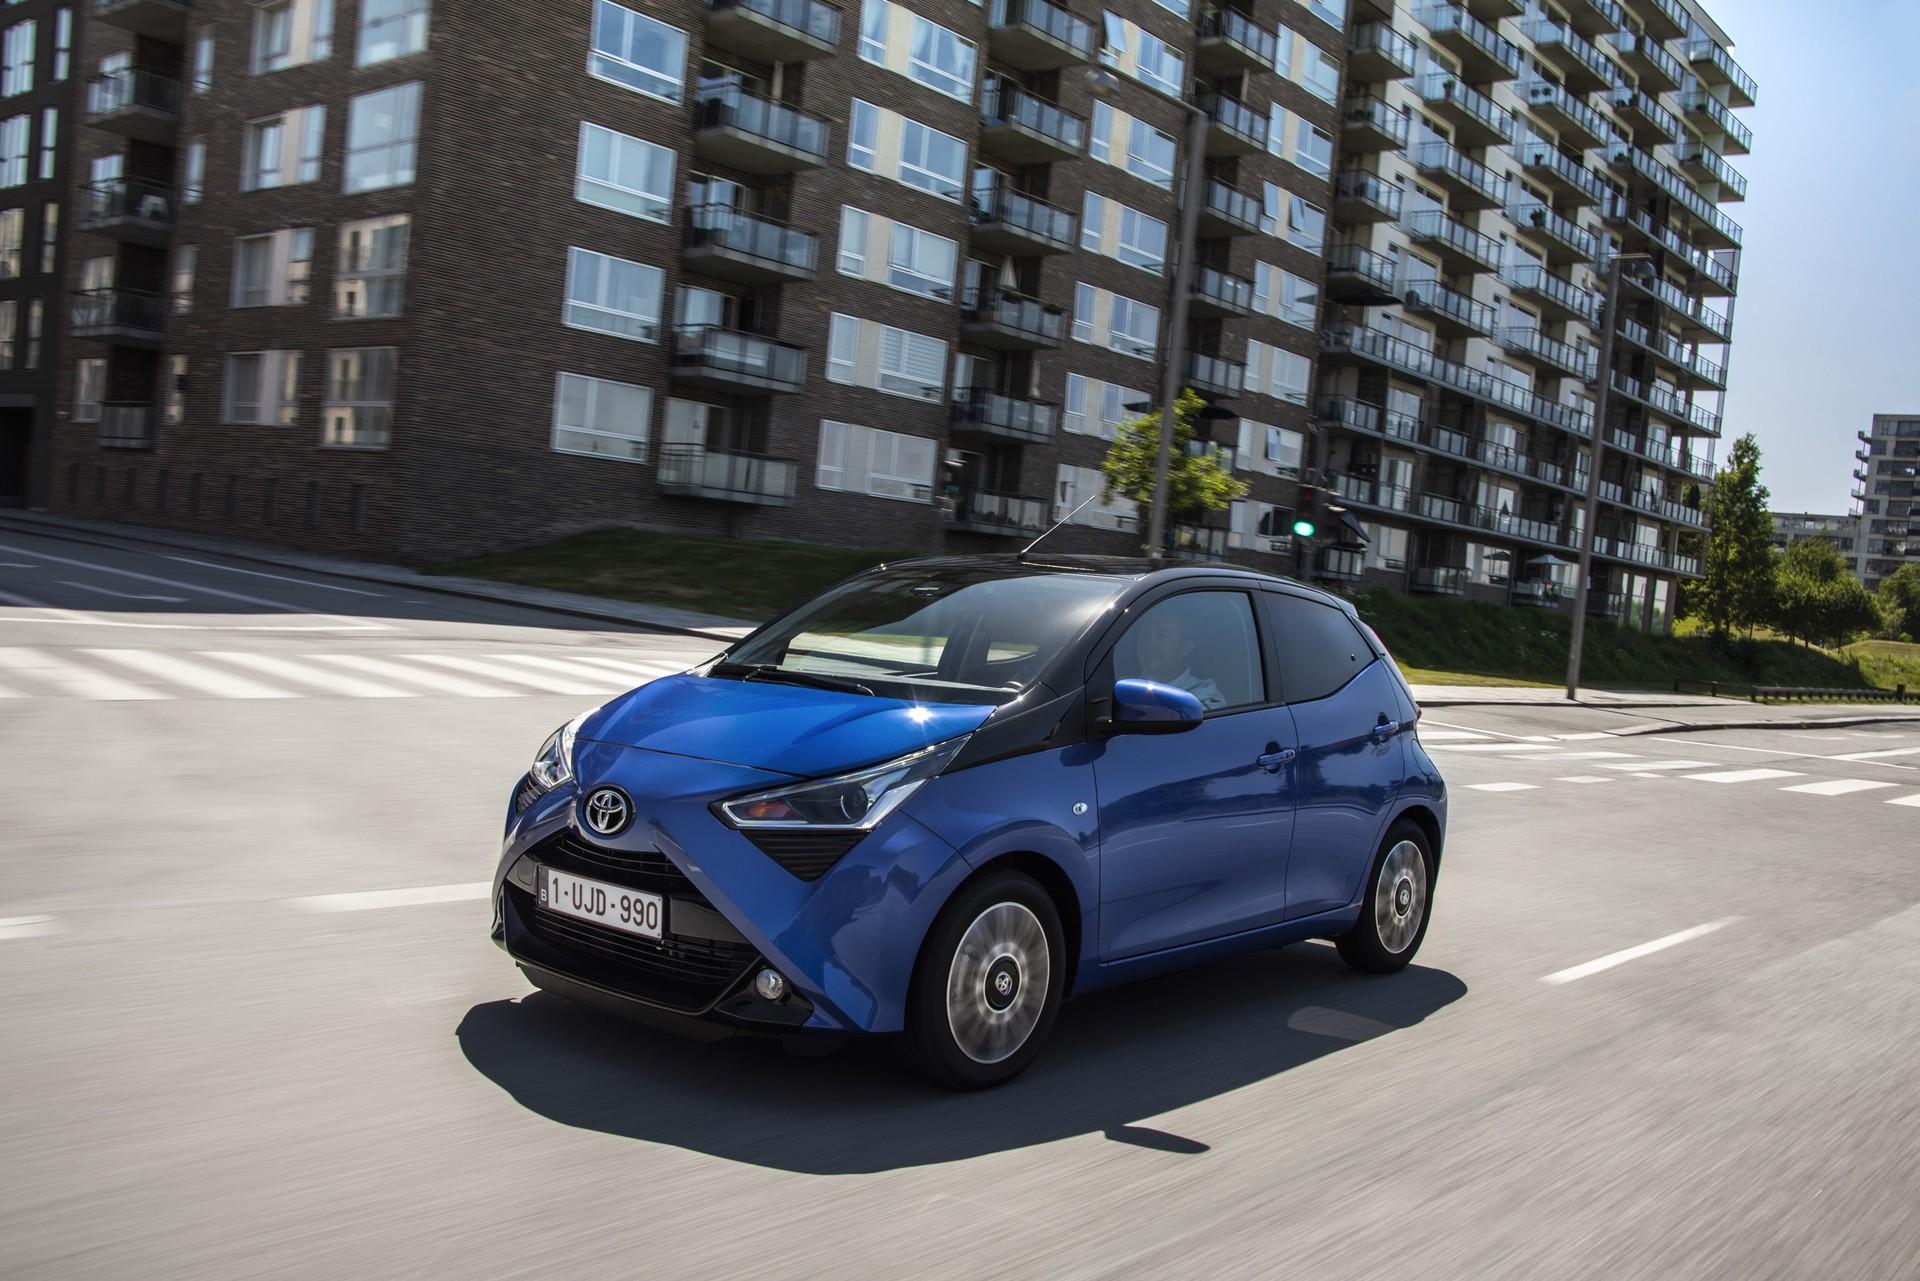 Toyota_Aygo_facelift_presskit_0015